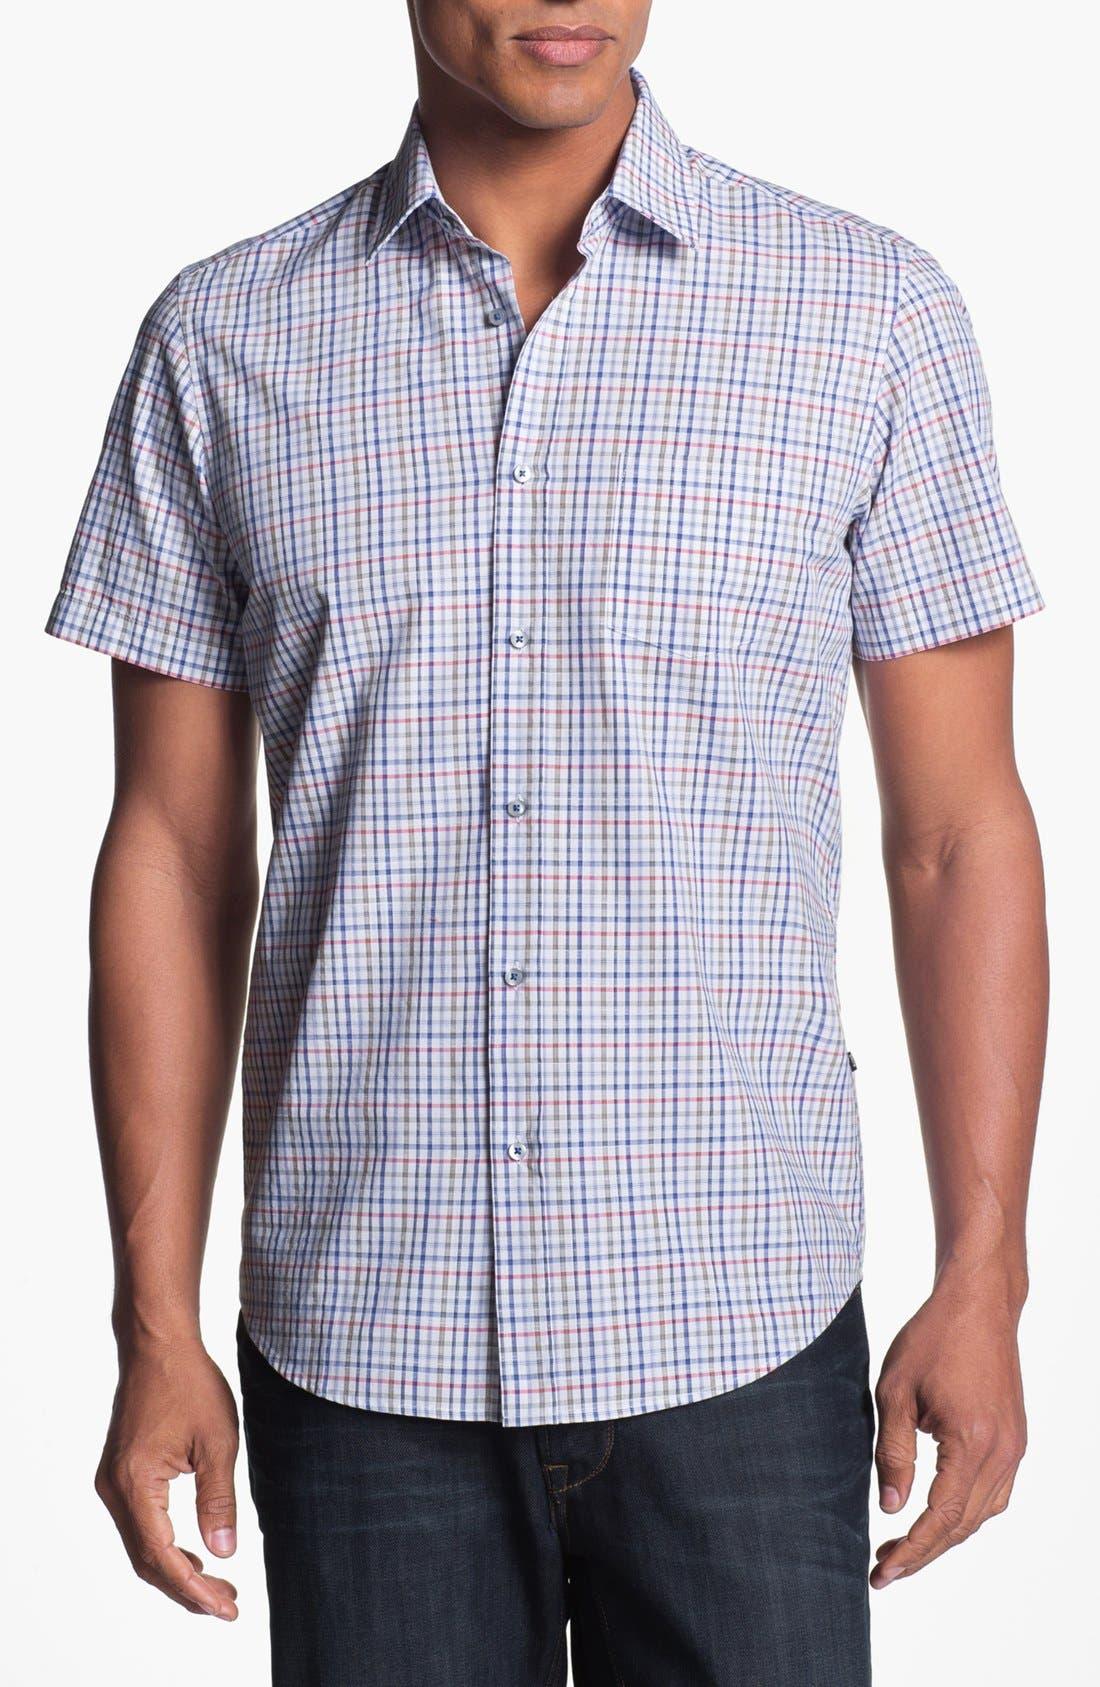 Alternate Image 1 Selected - BOSS HUGO BOSS 'Kenny' Regular Fit Plaid Short Sleeve Sport Shirt